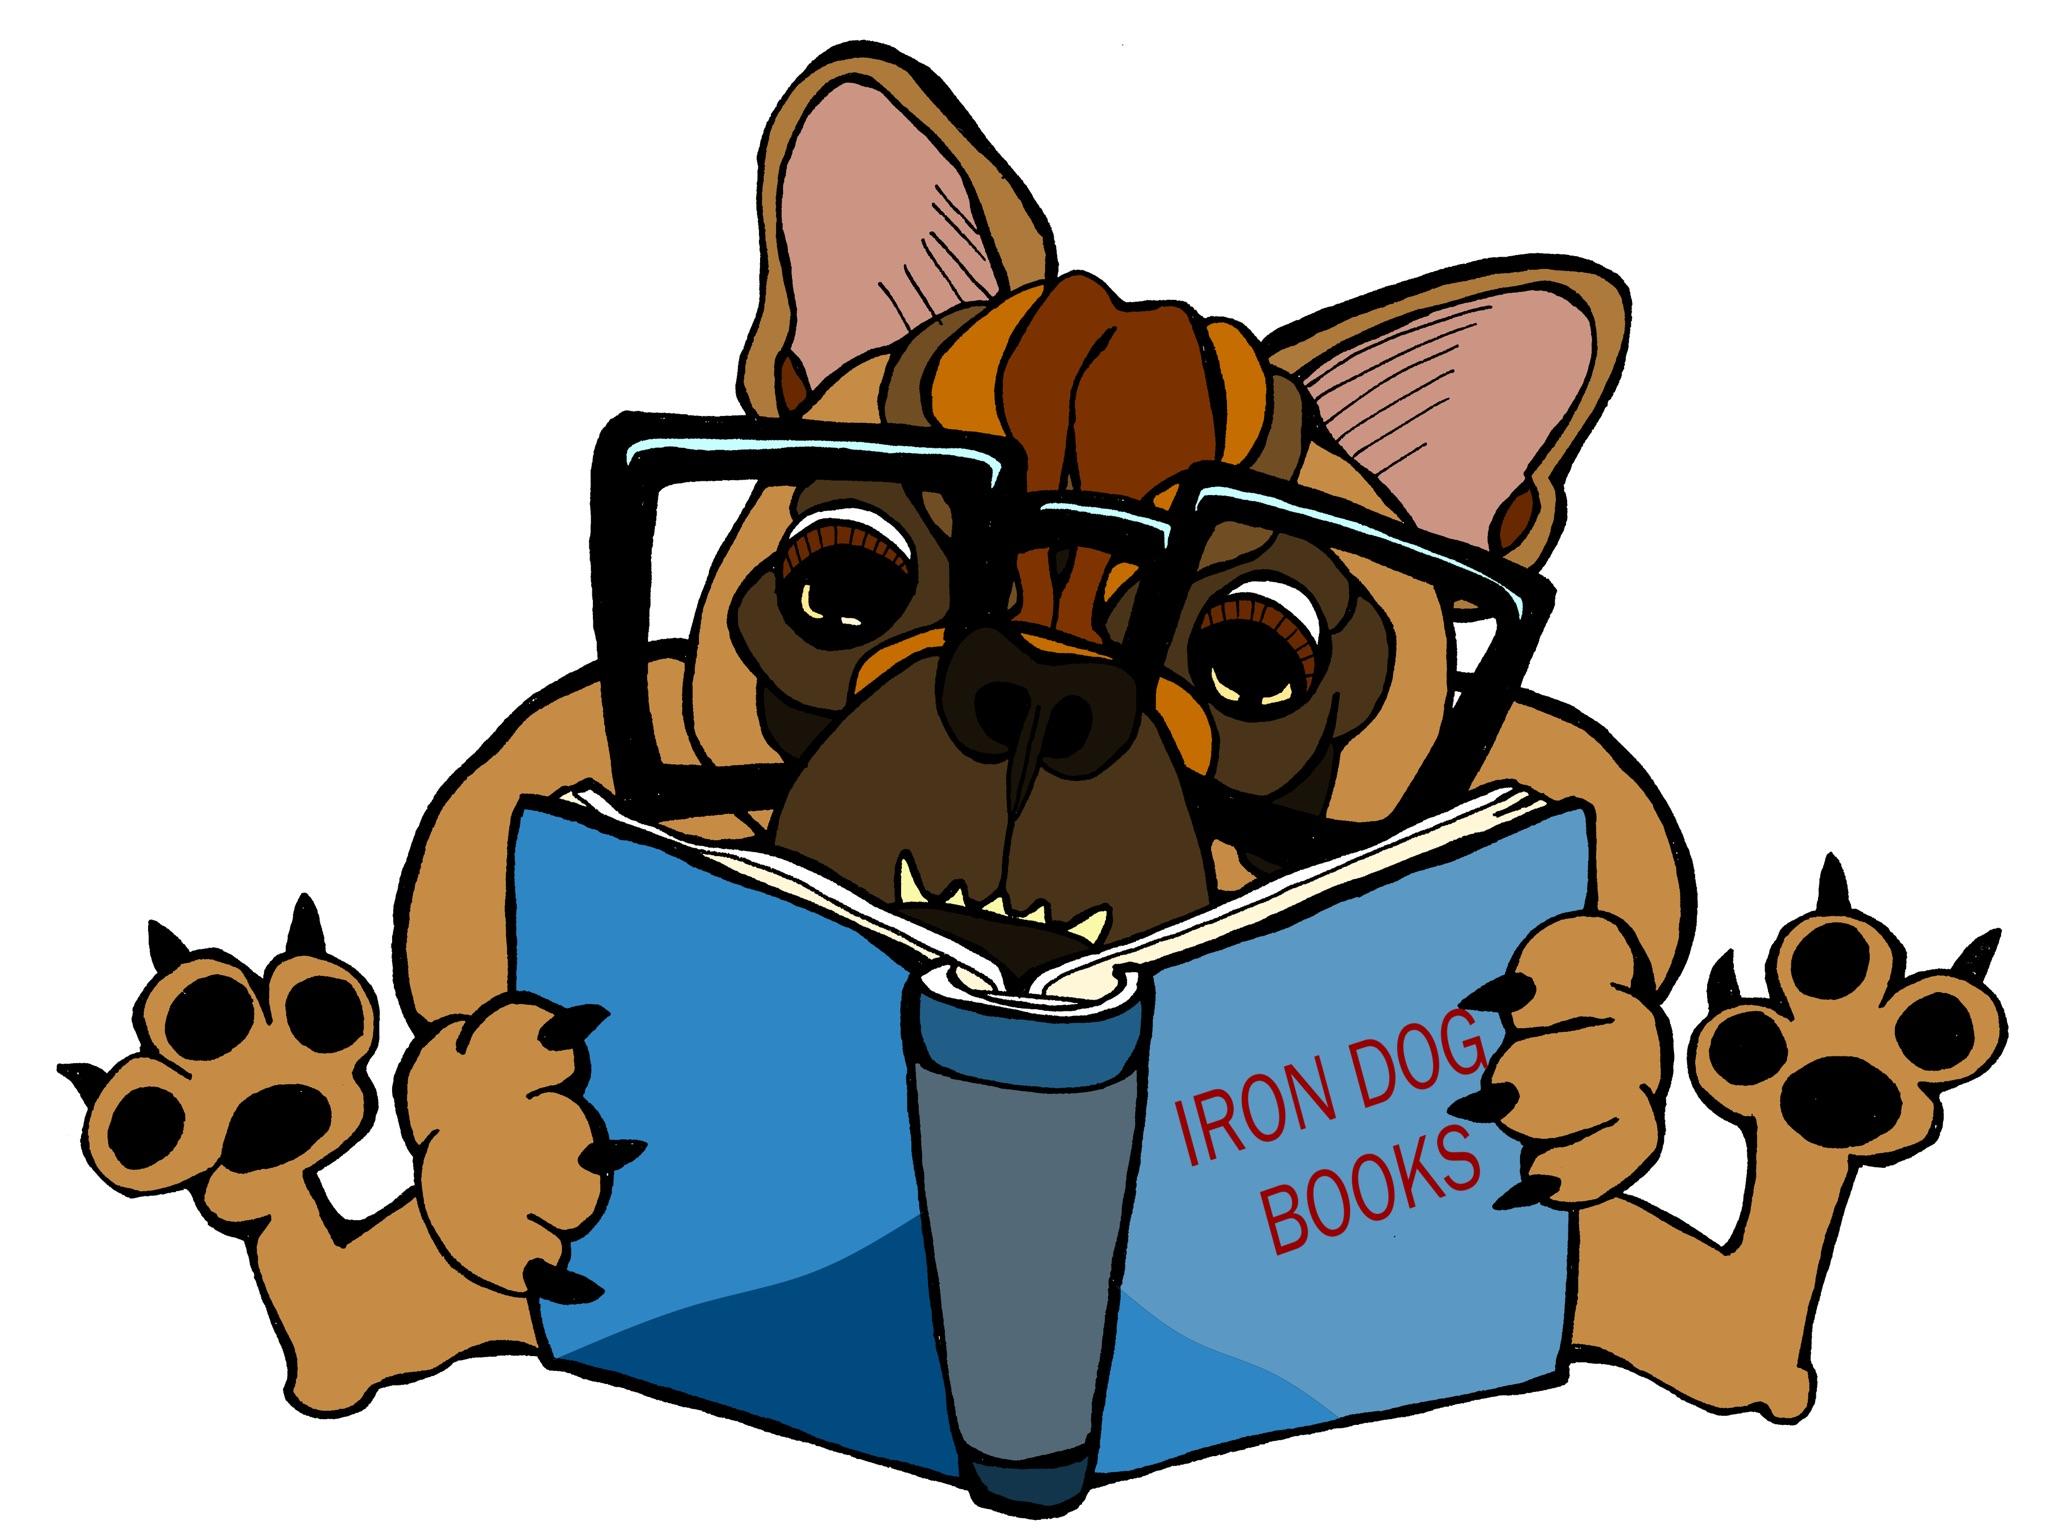 Literate French Bulldog by dea Kearns